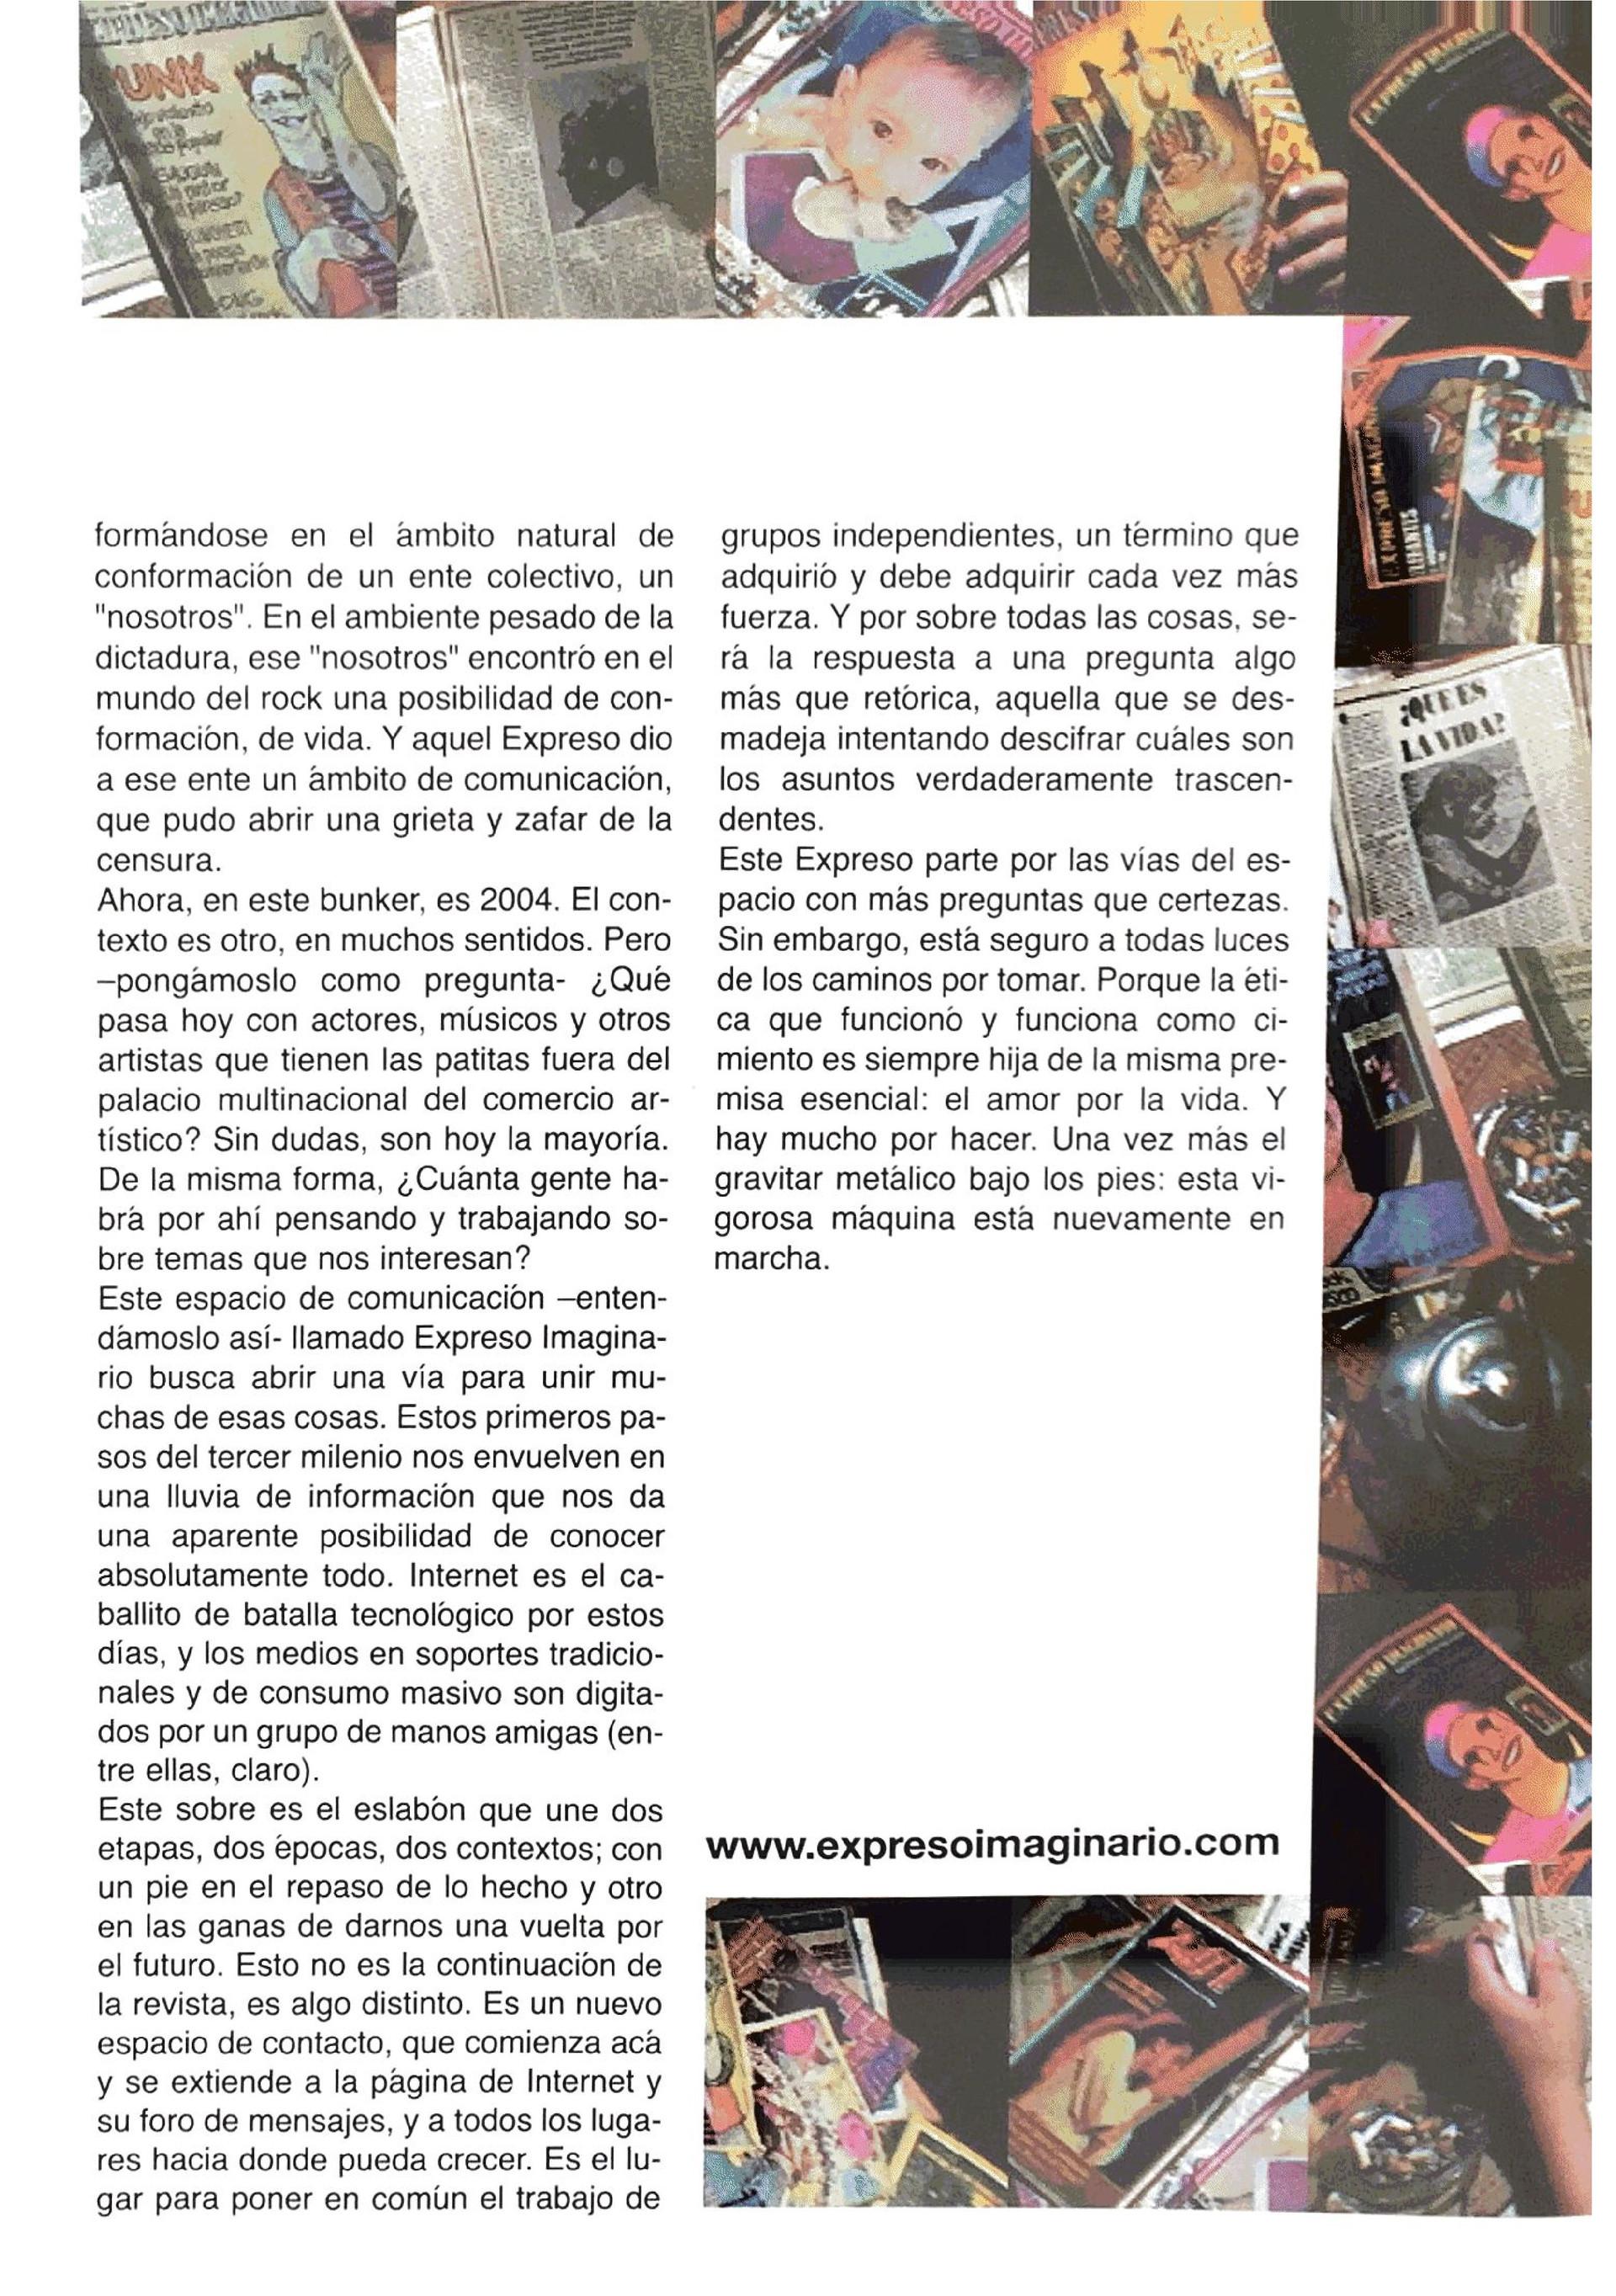 sobre expreso_Page_11.jpeg